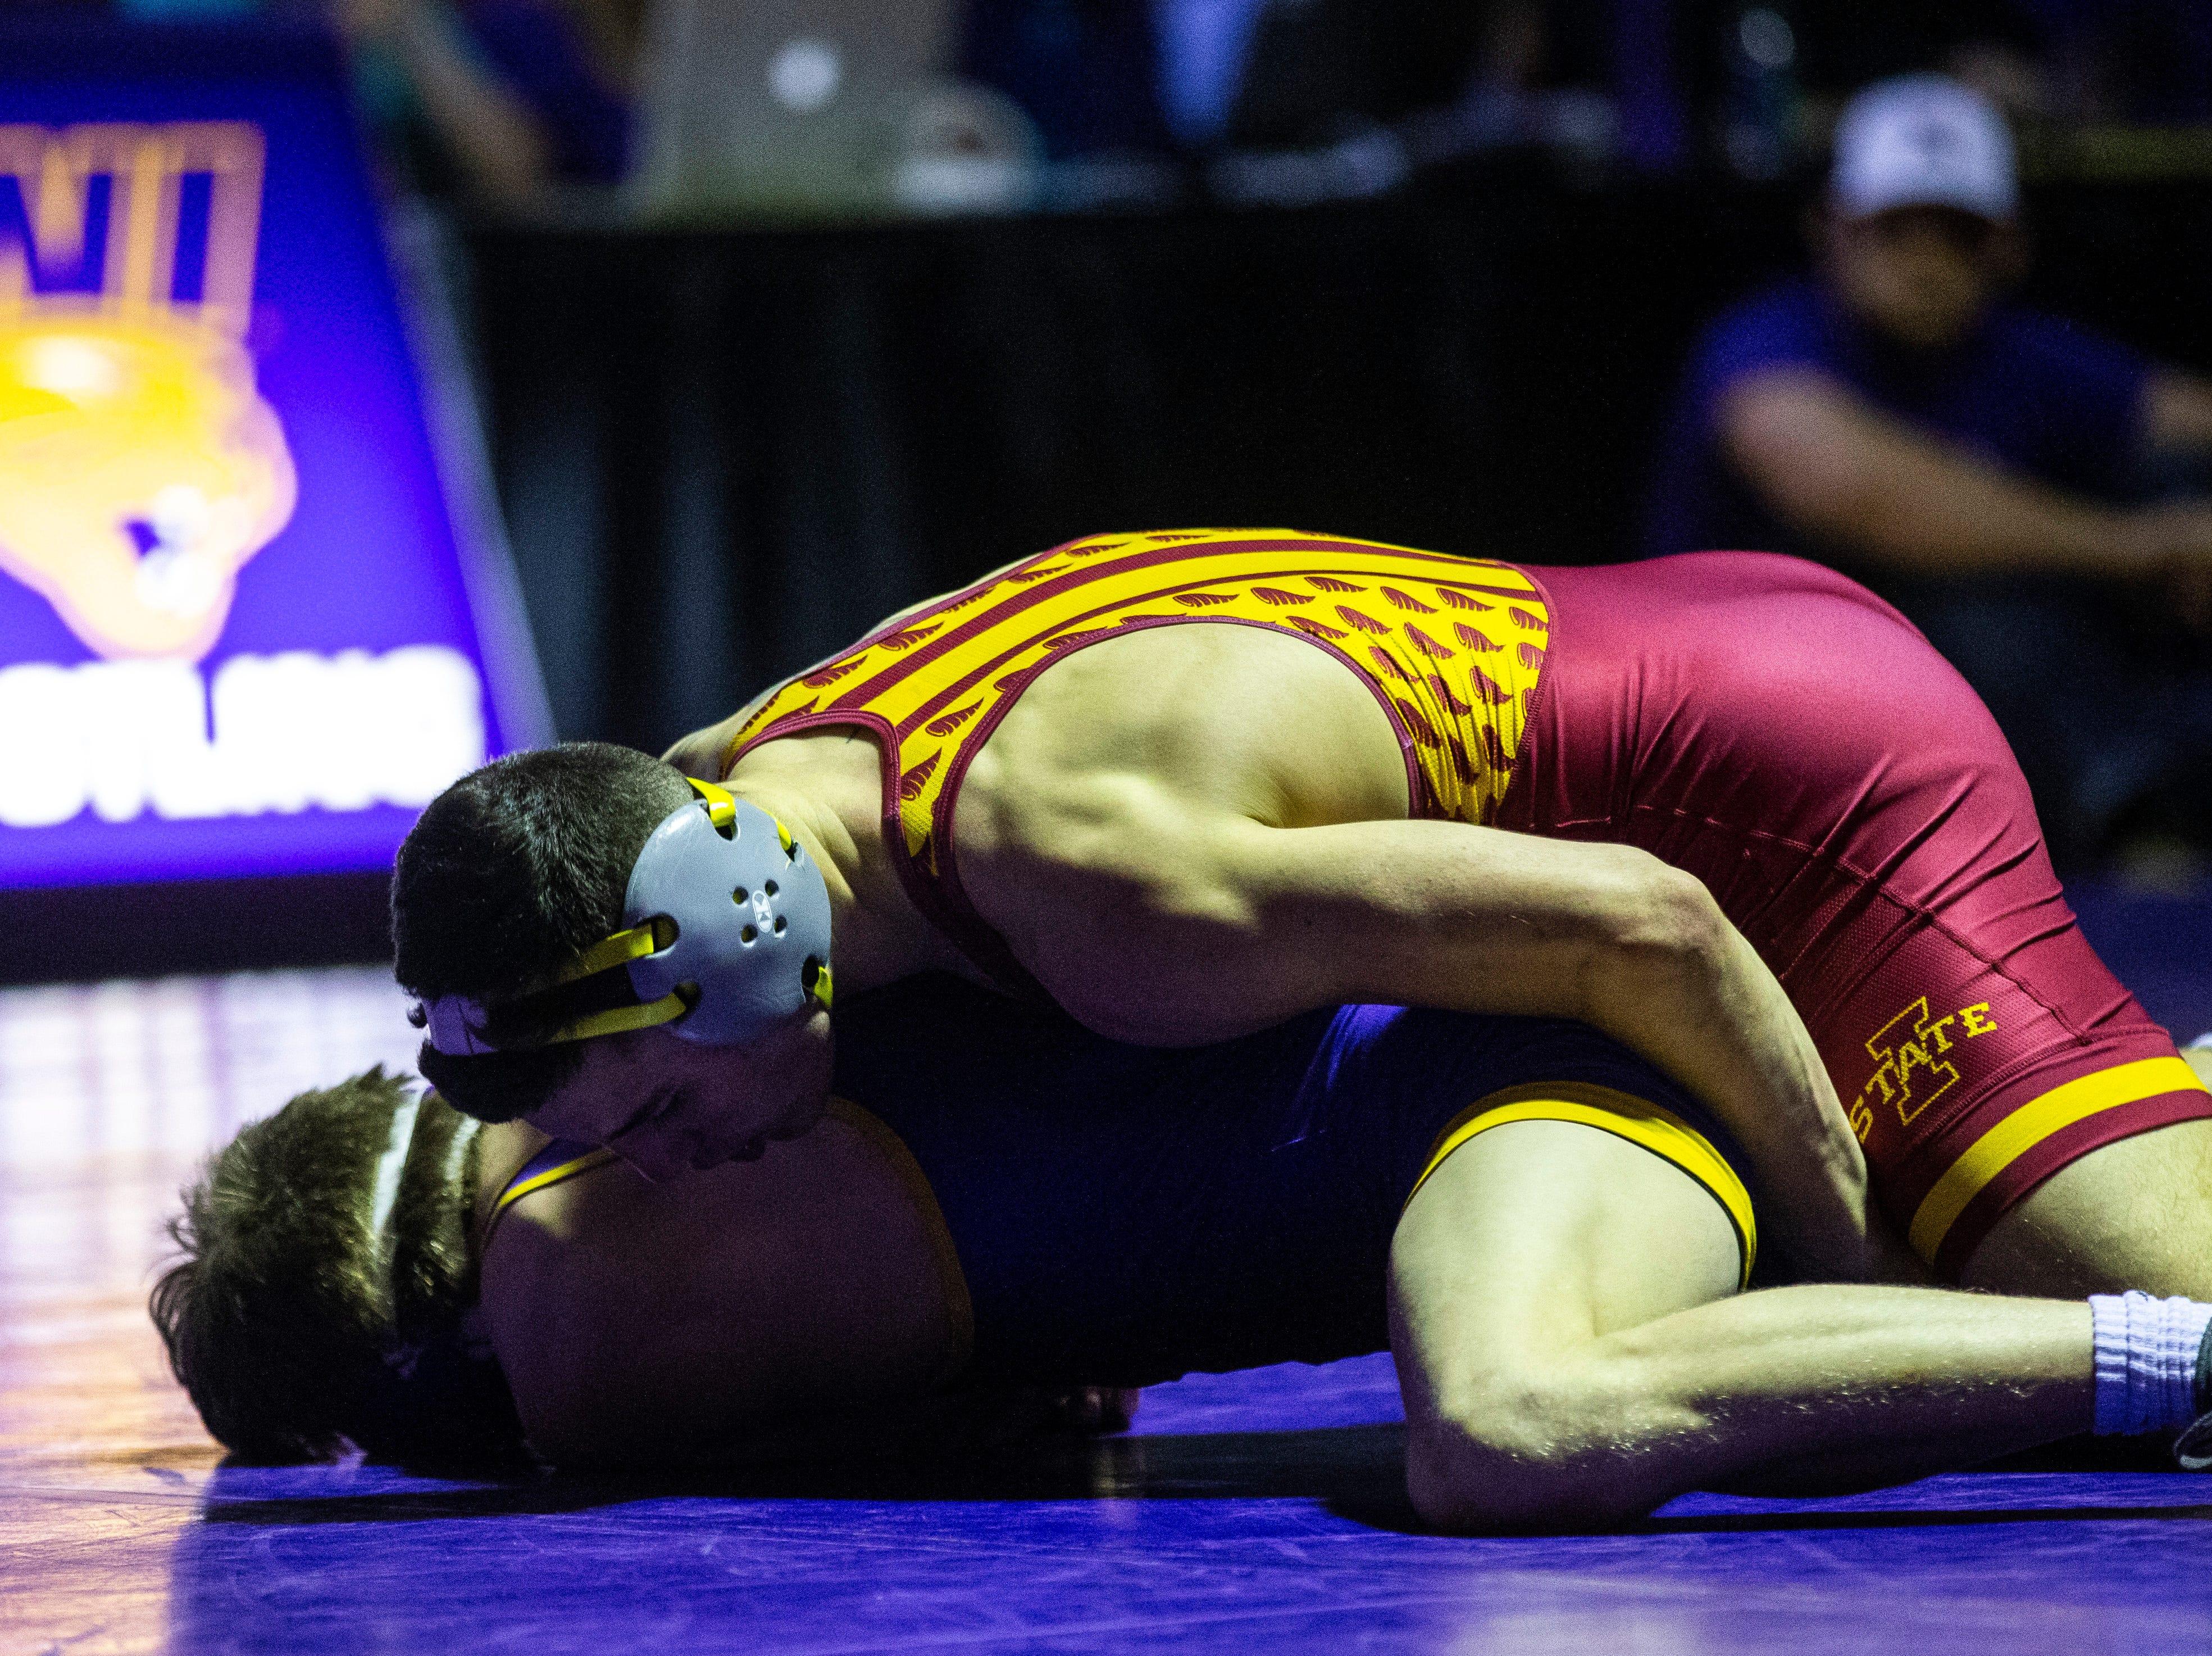 Iowa State's Austin Gomez wrestles Northern Iowa's Jack Skudlarczyk at 133 during a NCAA Big 12 wrestling dual on Thursday, Feb. 21, 2019 at the West Gymnasium in Cedar Falls, Iowa.